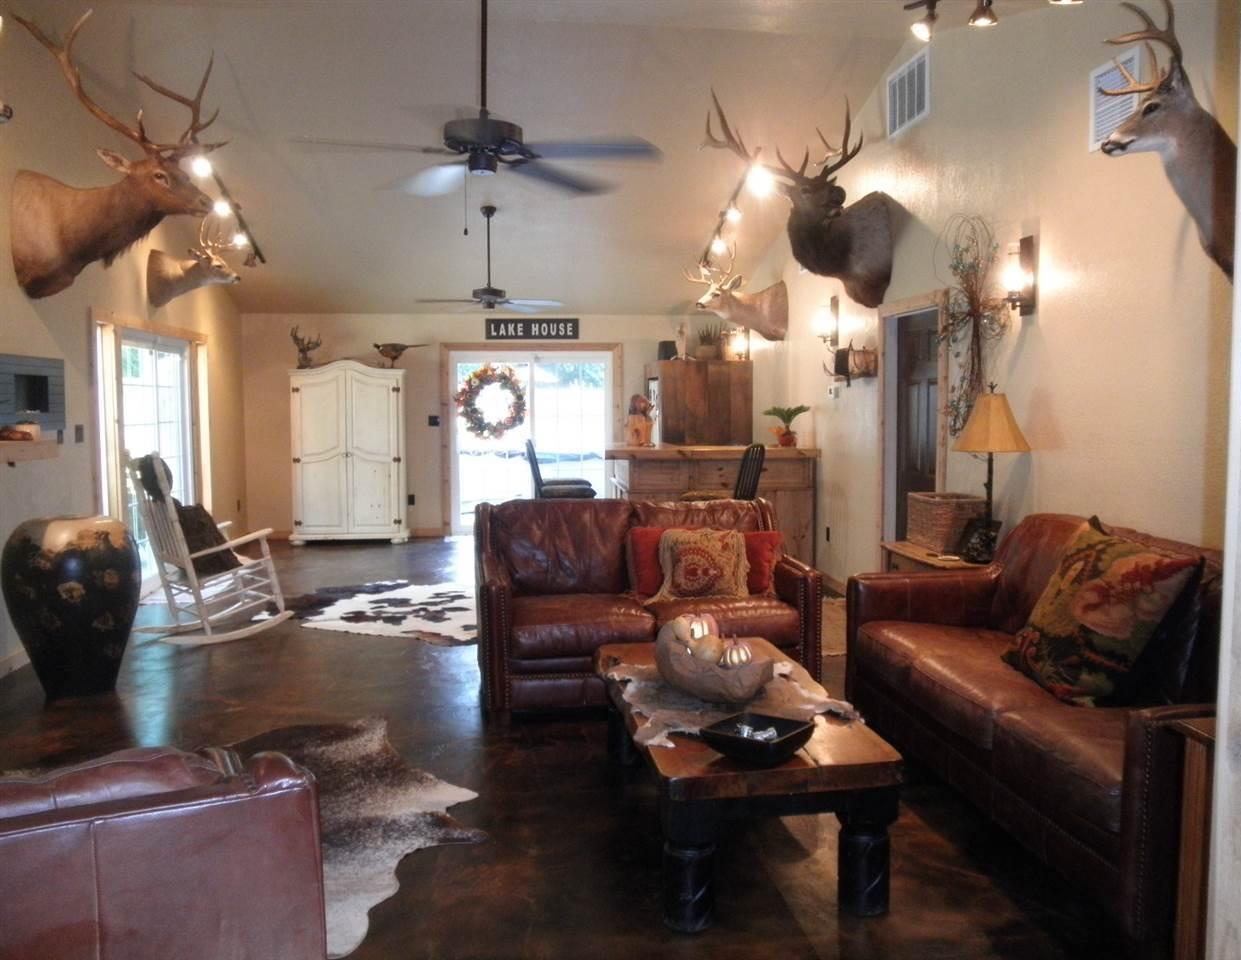 Sold Cross Sale W/ MLS | 54 Pike Lane  Ponca City, OK 74604 16